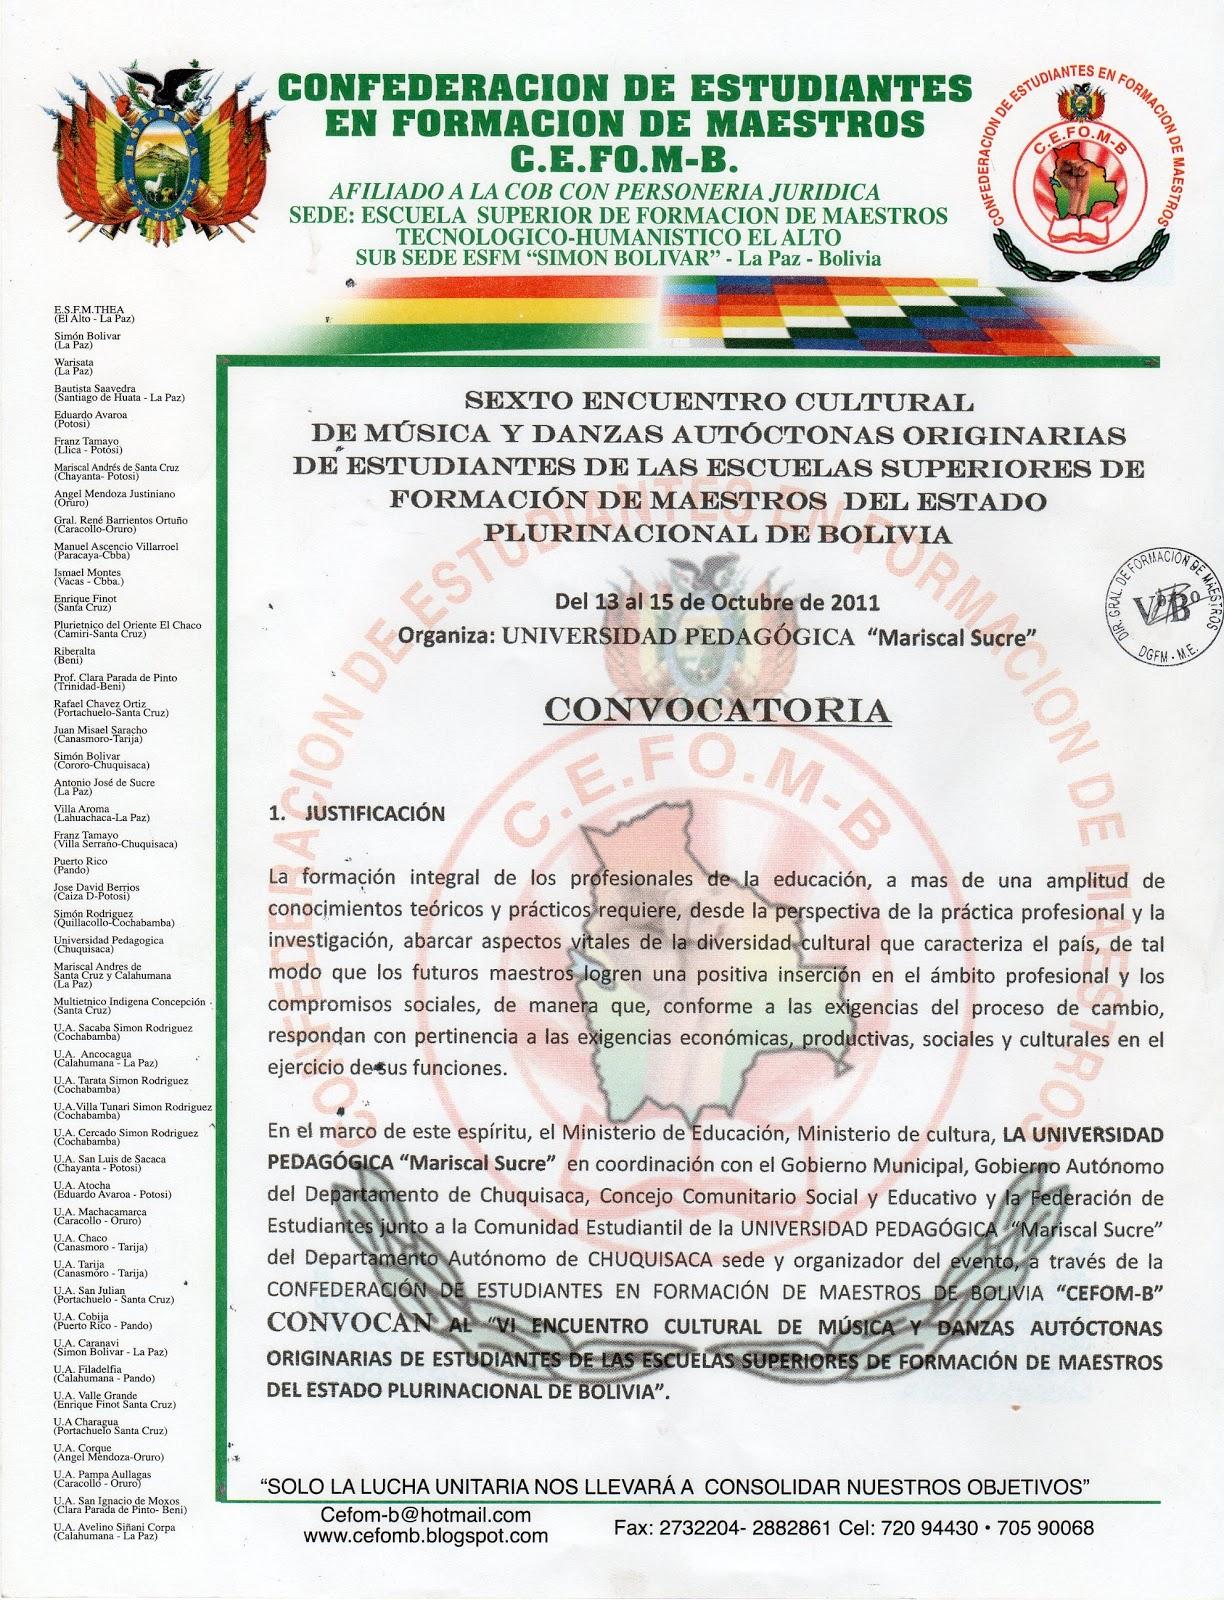 Cefom b bolivia confederaci n de estudiantes en formaci n for Convocatoria de maestros